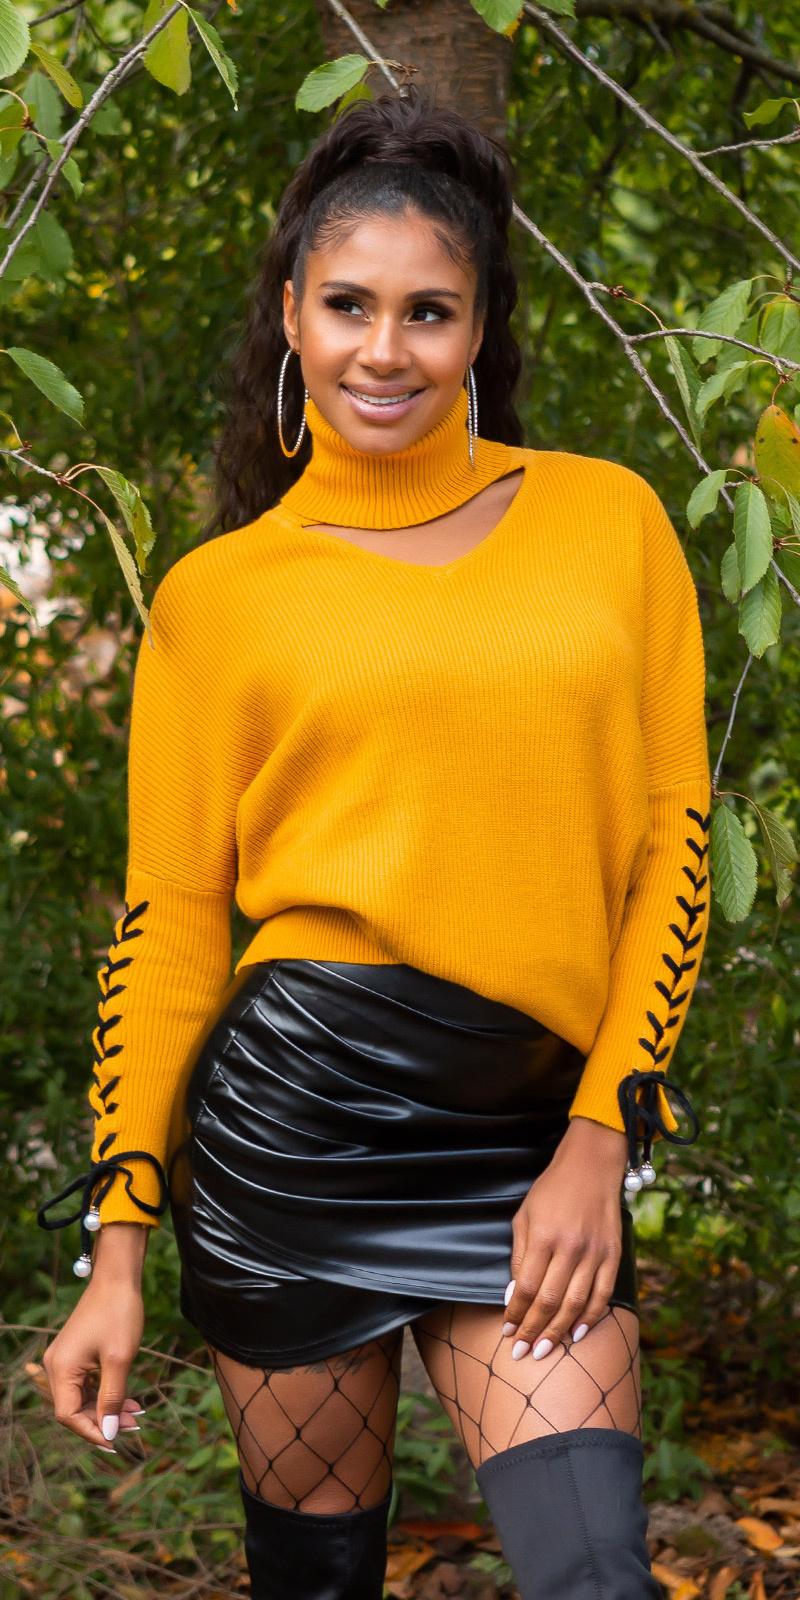 Trendy col trui met uitsparing mosterdgeel